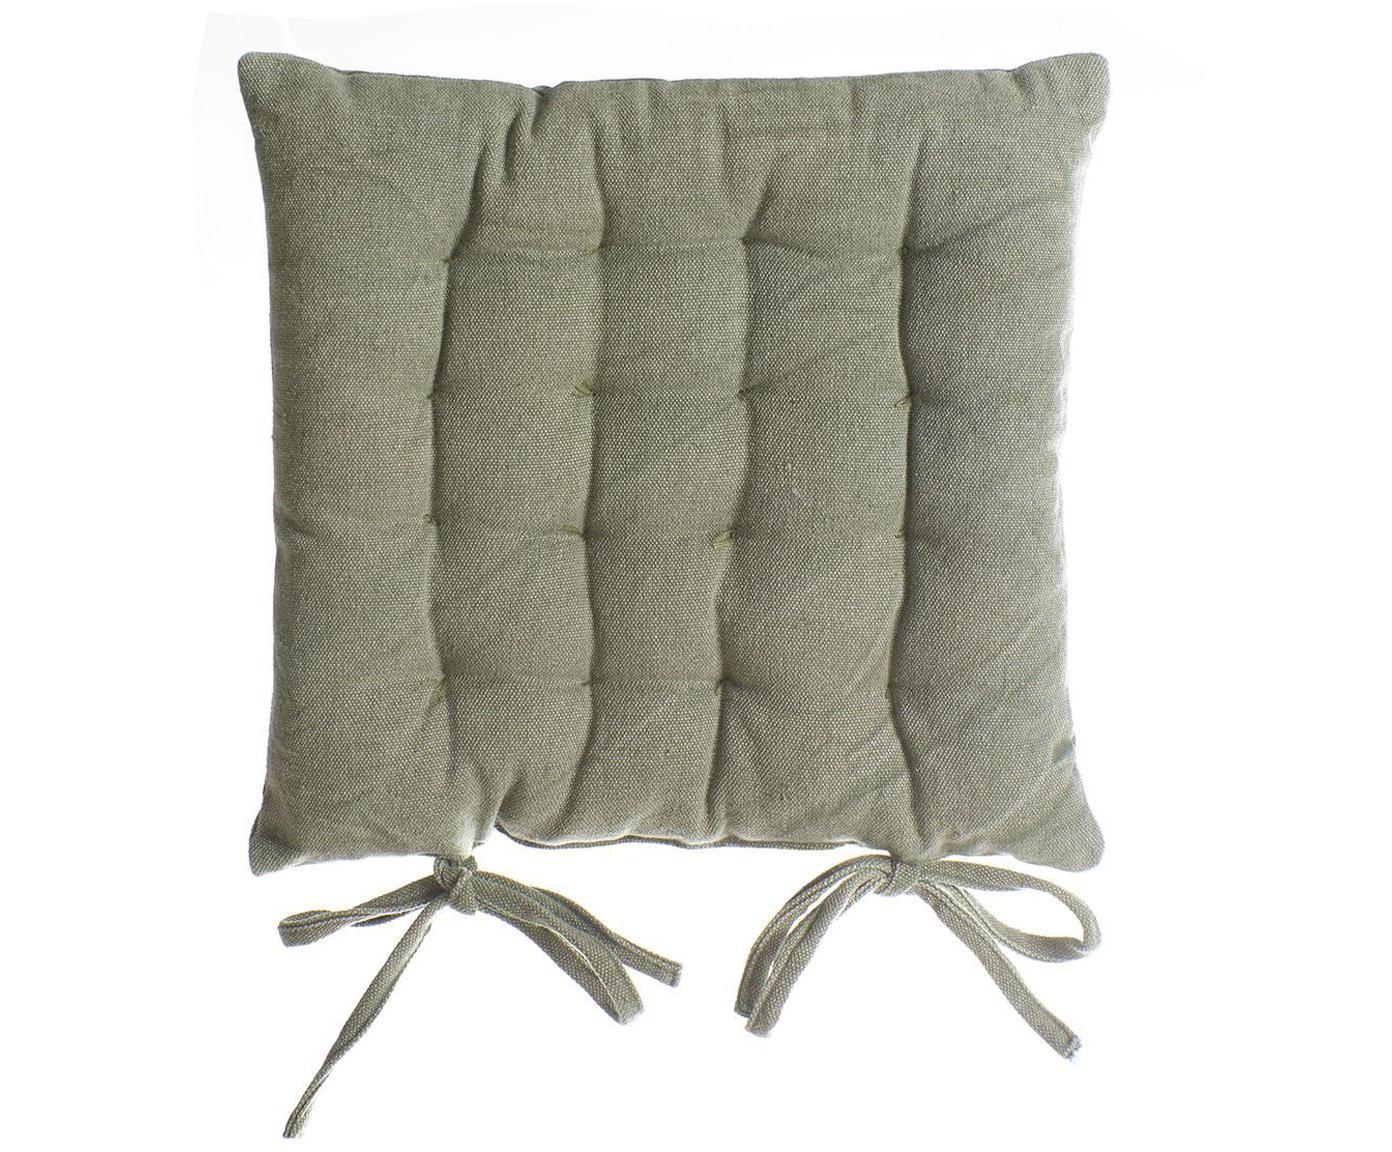 Cojín de asiento Benni, Funda: algodón, Verde, An 40 x L 40 cm